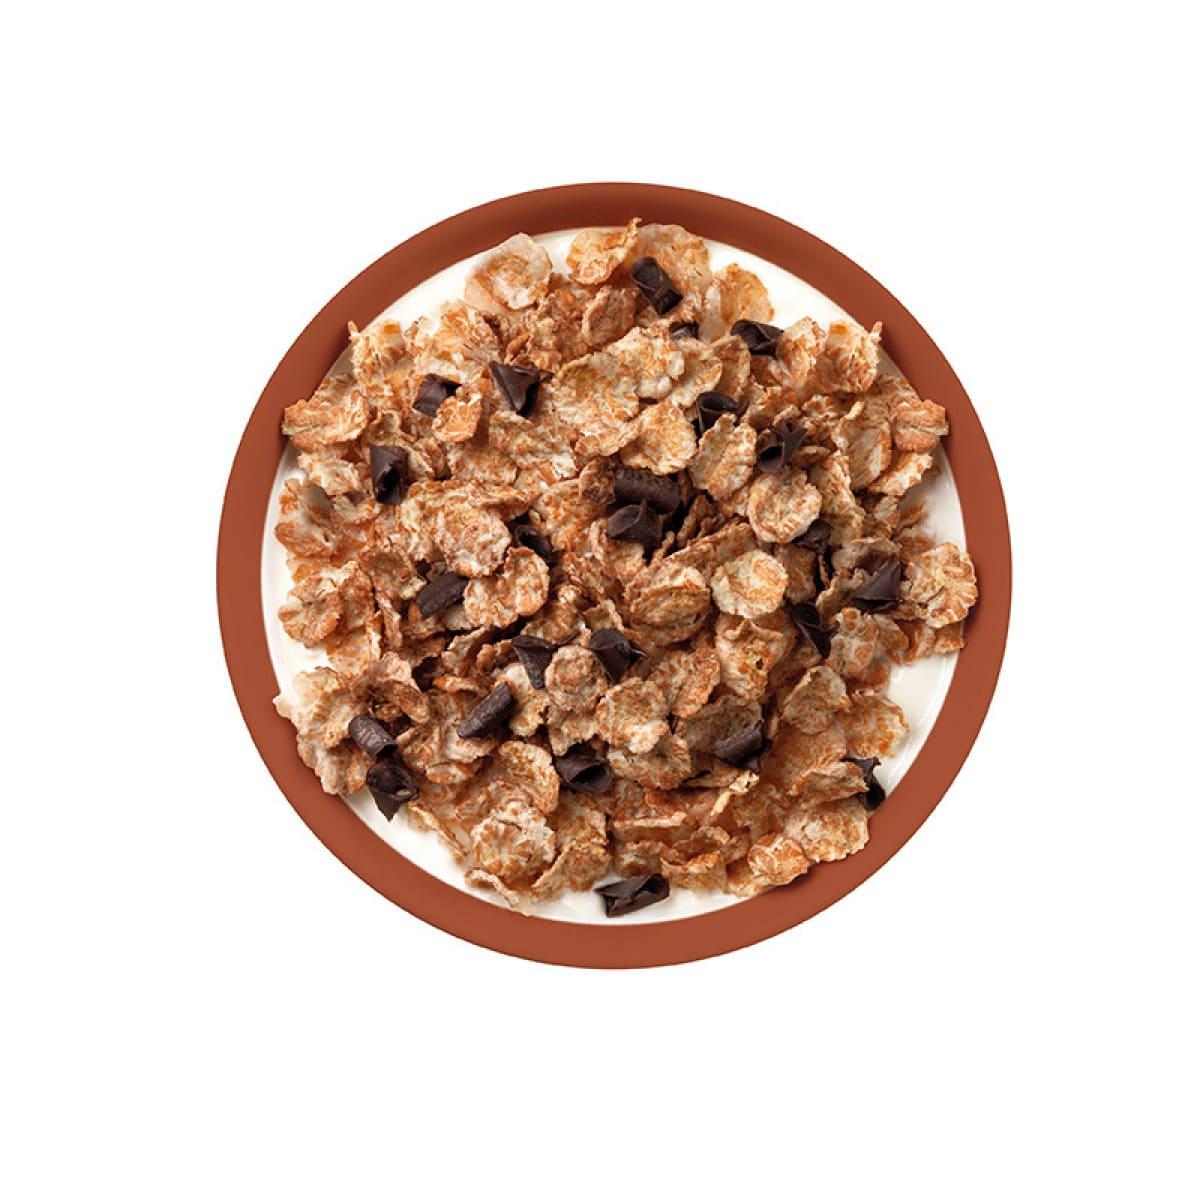 WW Knusper-Dinkel-Müsli mit Schokolade 2